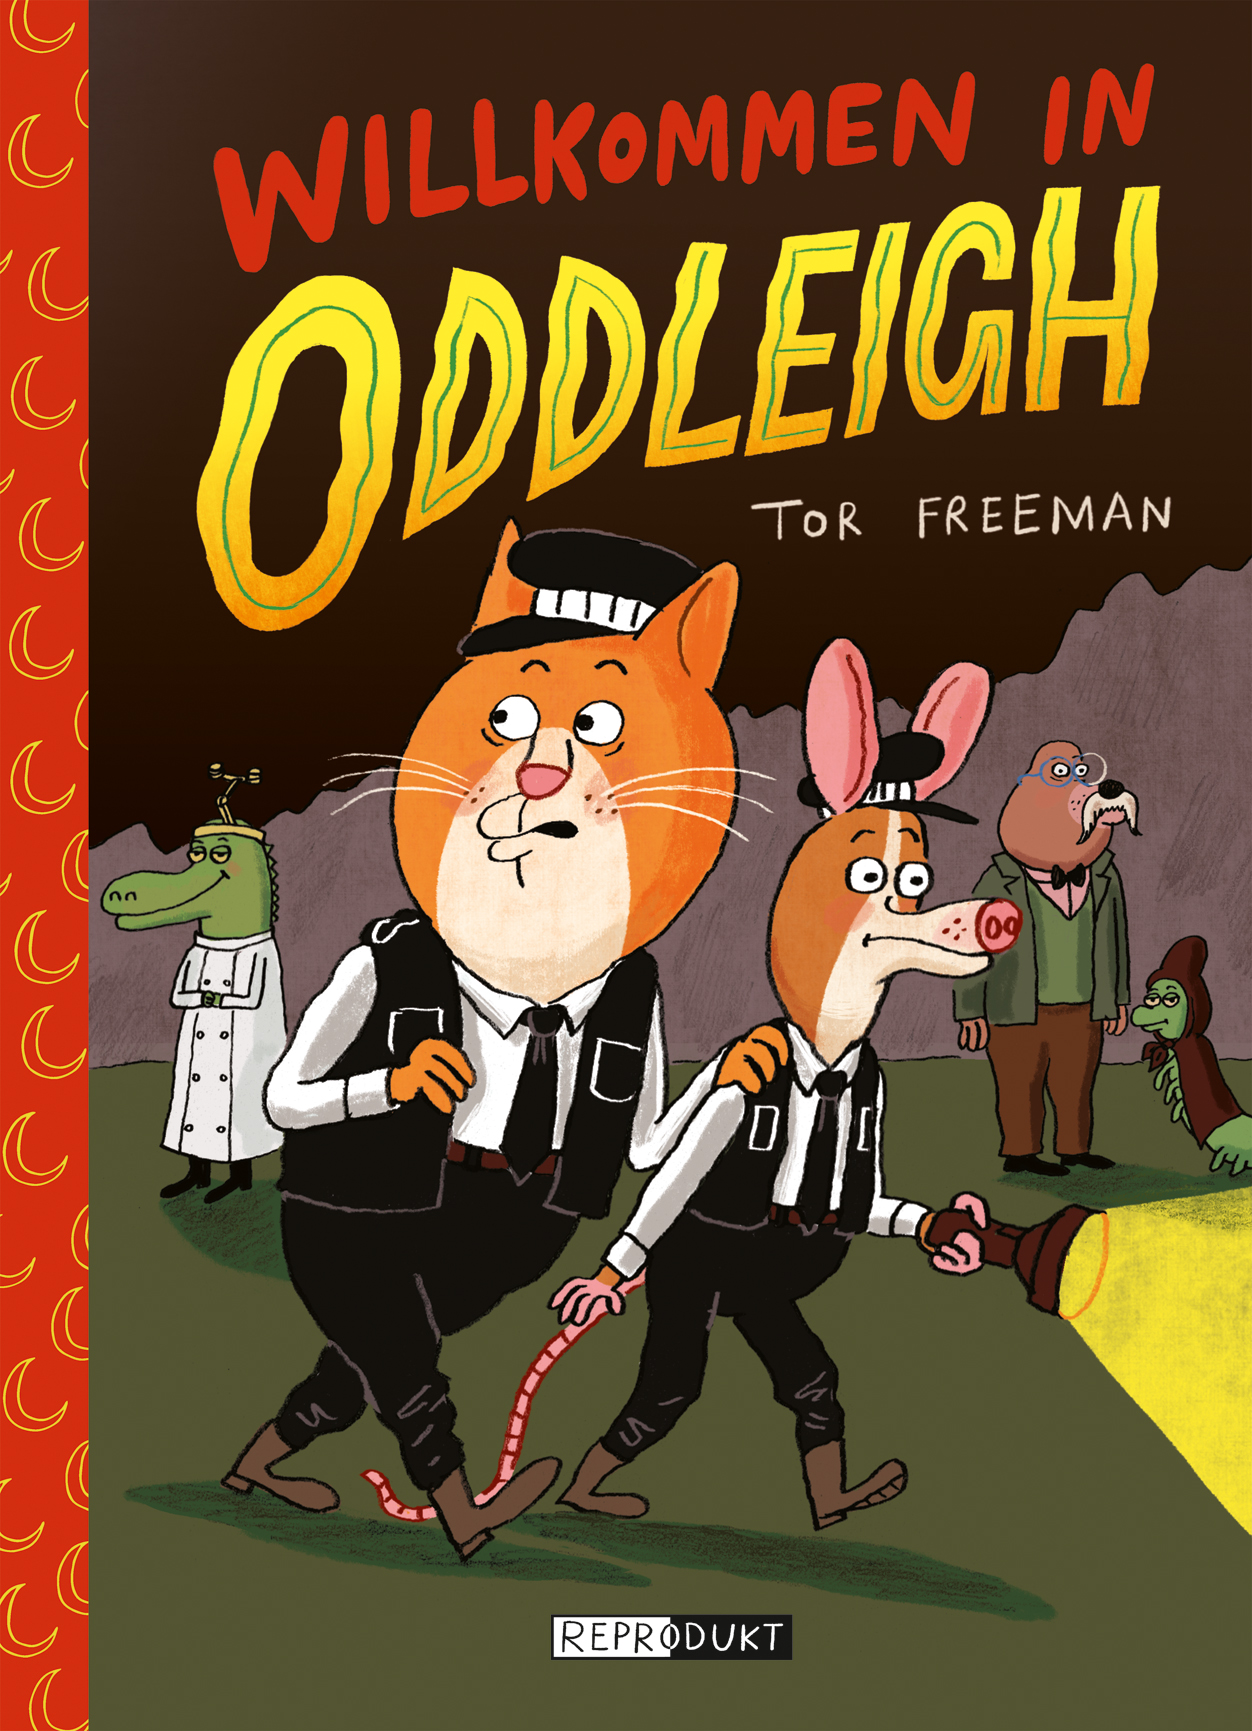 Comic, Kindercomic, Tiere, Krimi, selber lesen, Grundschule, ab 9, Tor Freemann, Reprodukt, Comic-Tipp für Kinder